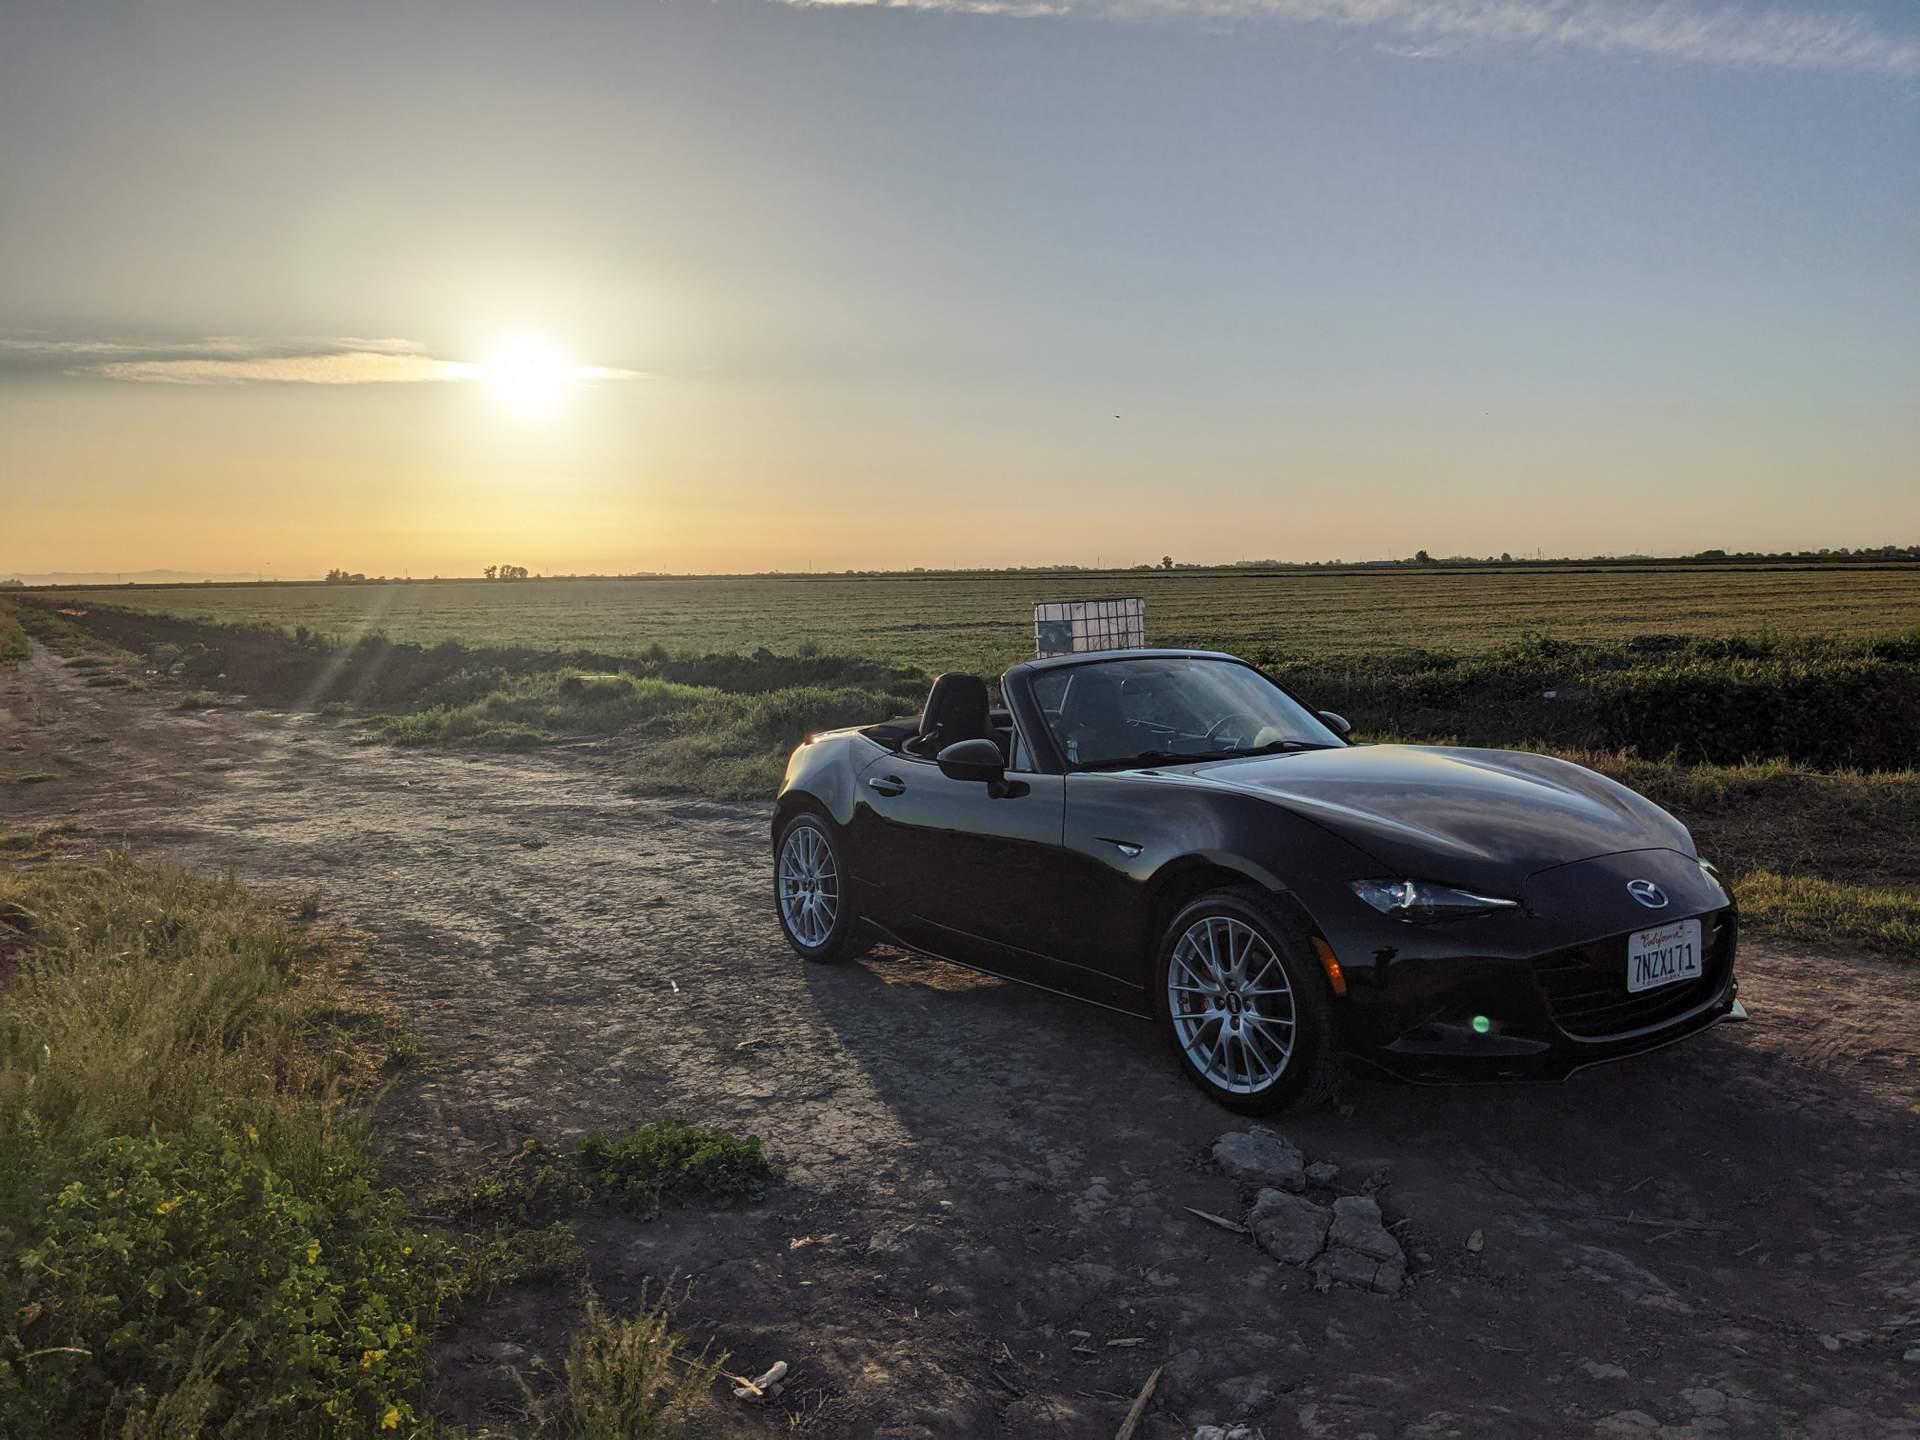 Featured photo for Mazda MX-5 Miata Turo Rental